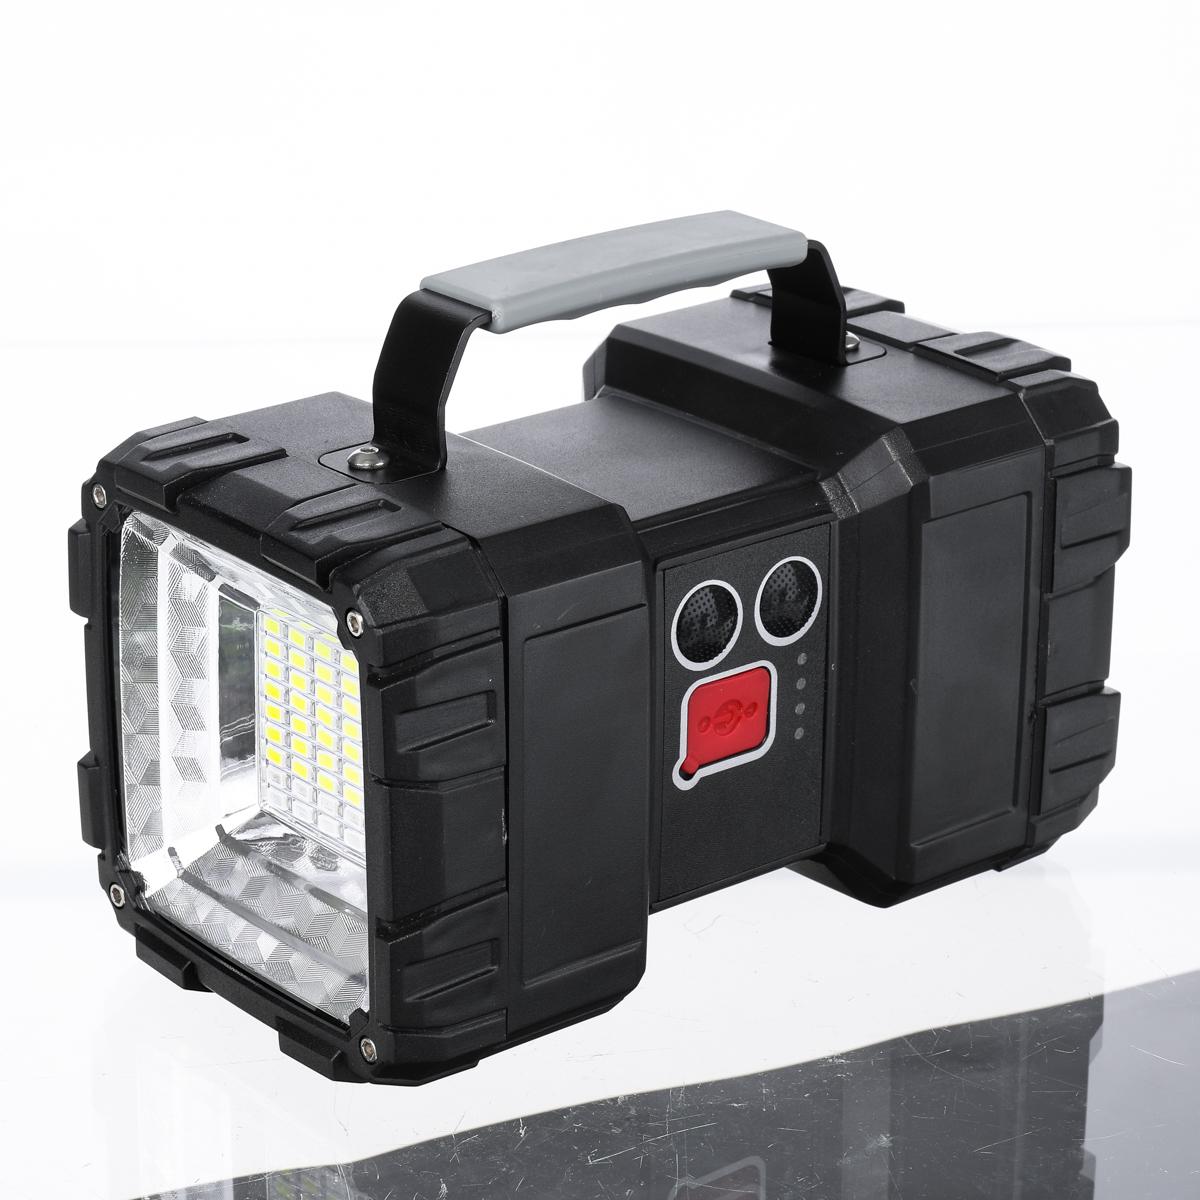 Xmund XD-FL2 P50+45LED 3Modes Double Light 1000Lumens USB Rechargeable portable